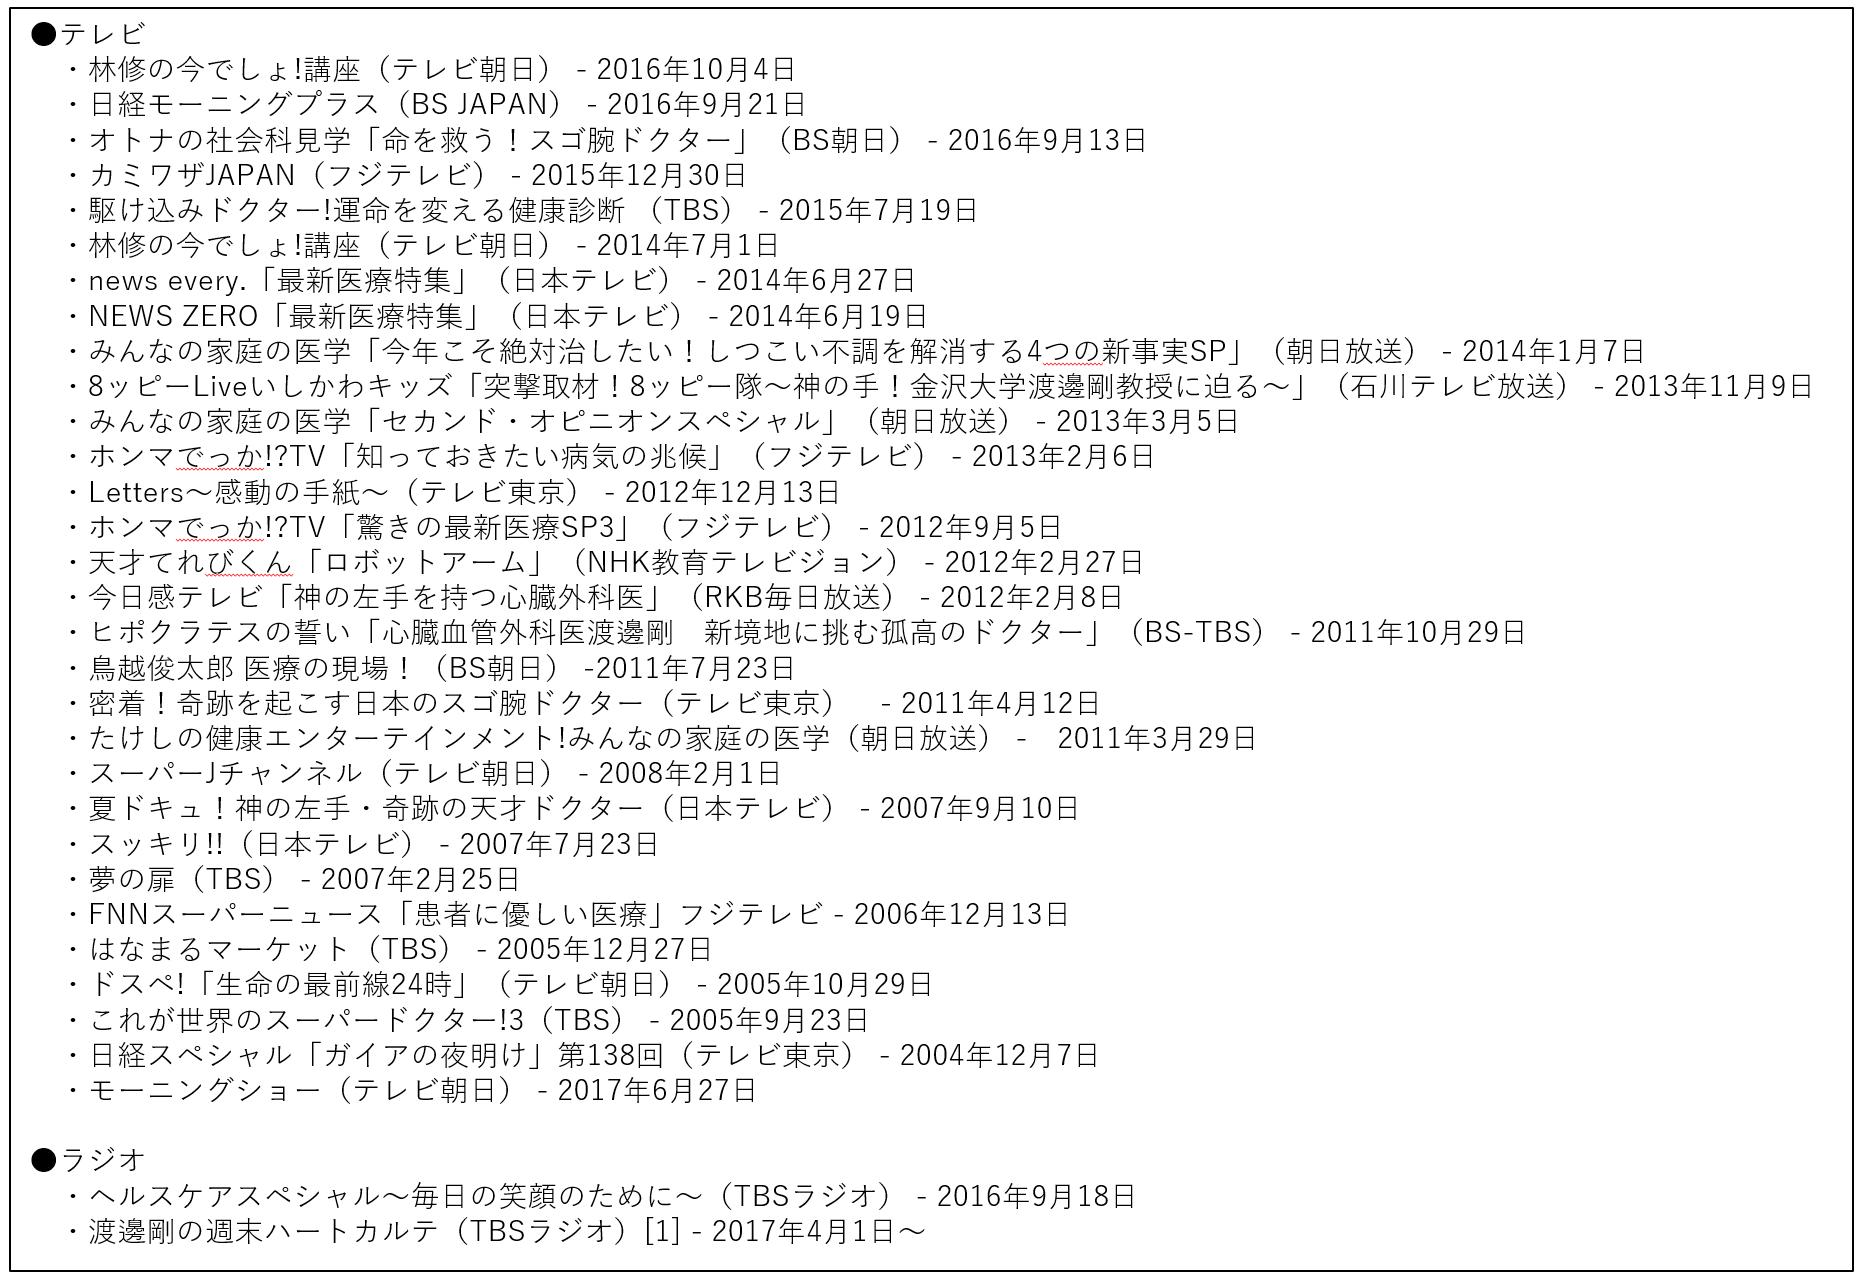 渡邊剛のメディア報道歴